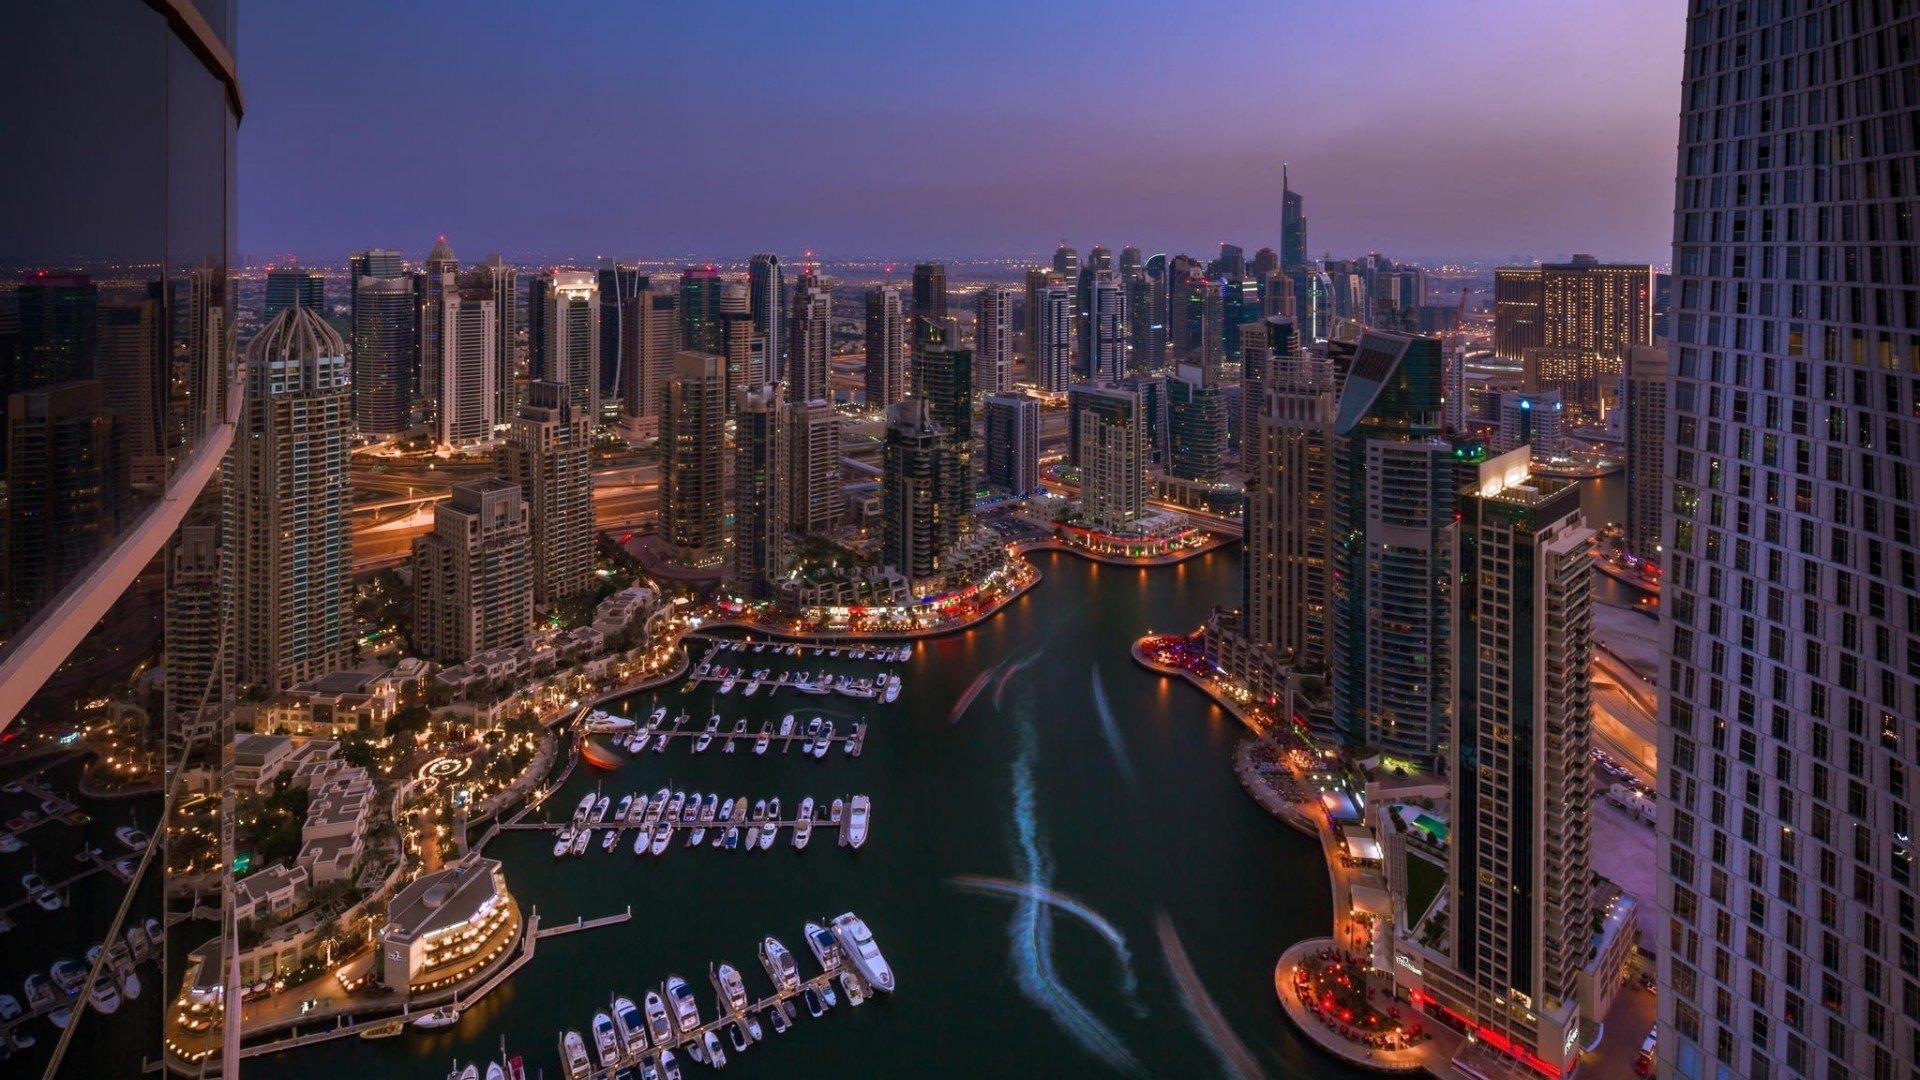 Man Made - Dubai  Wallpaper